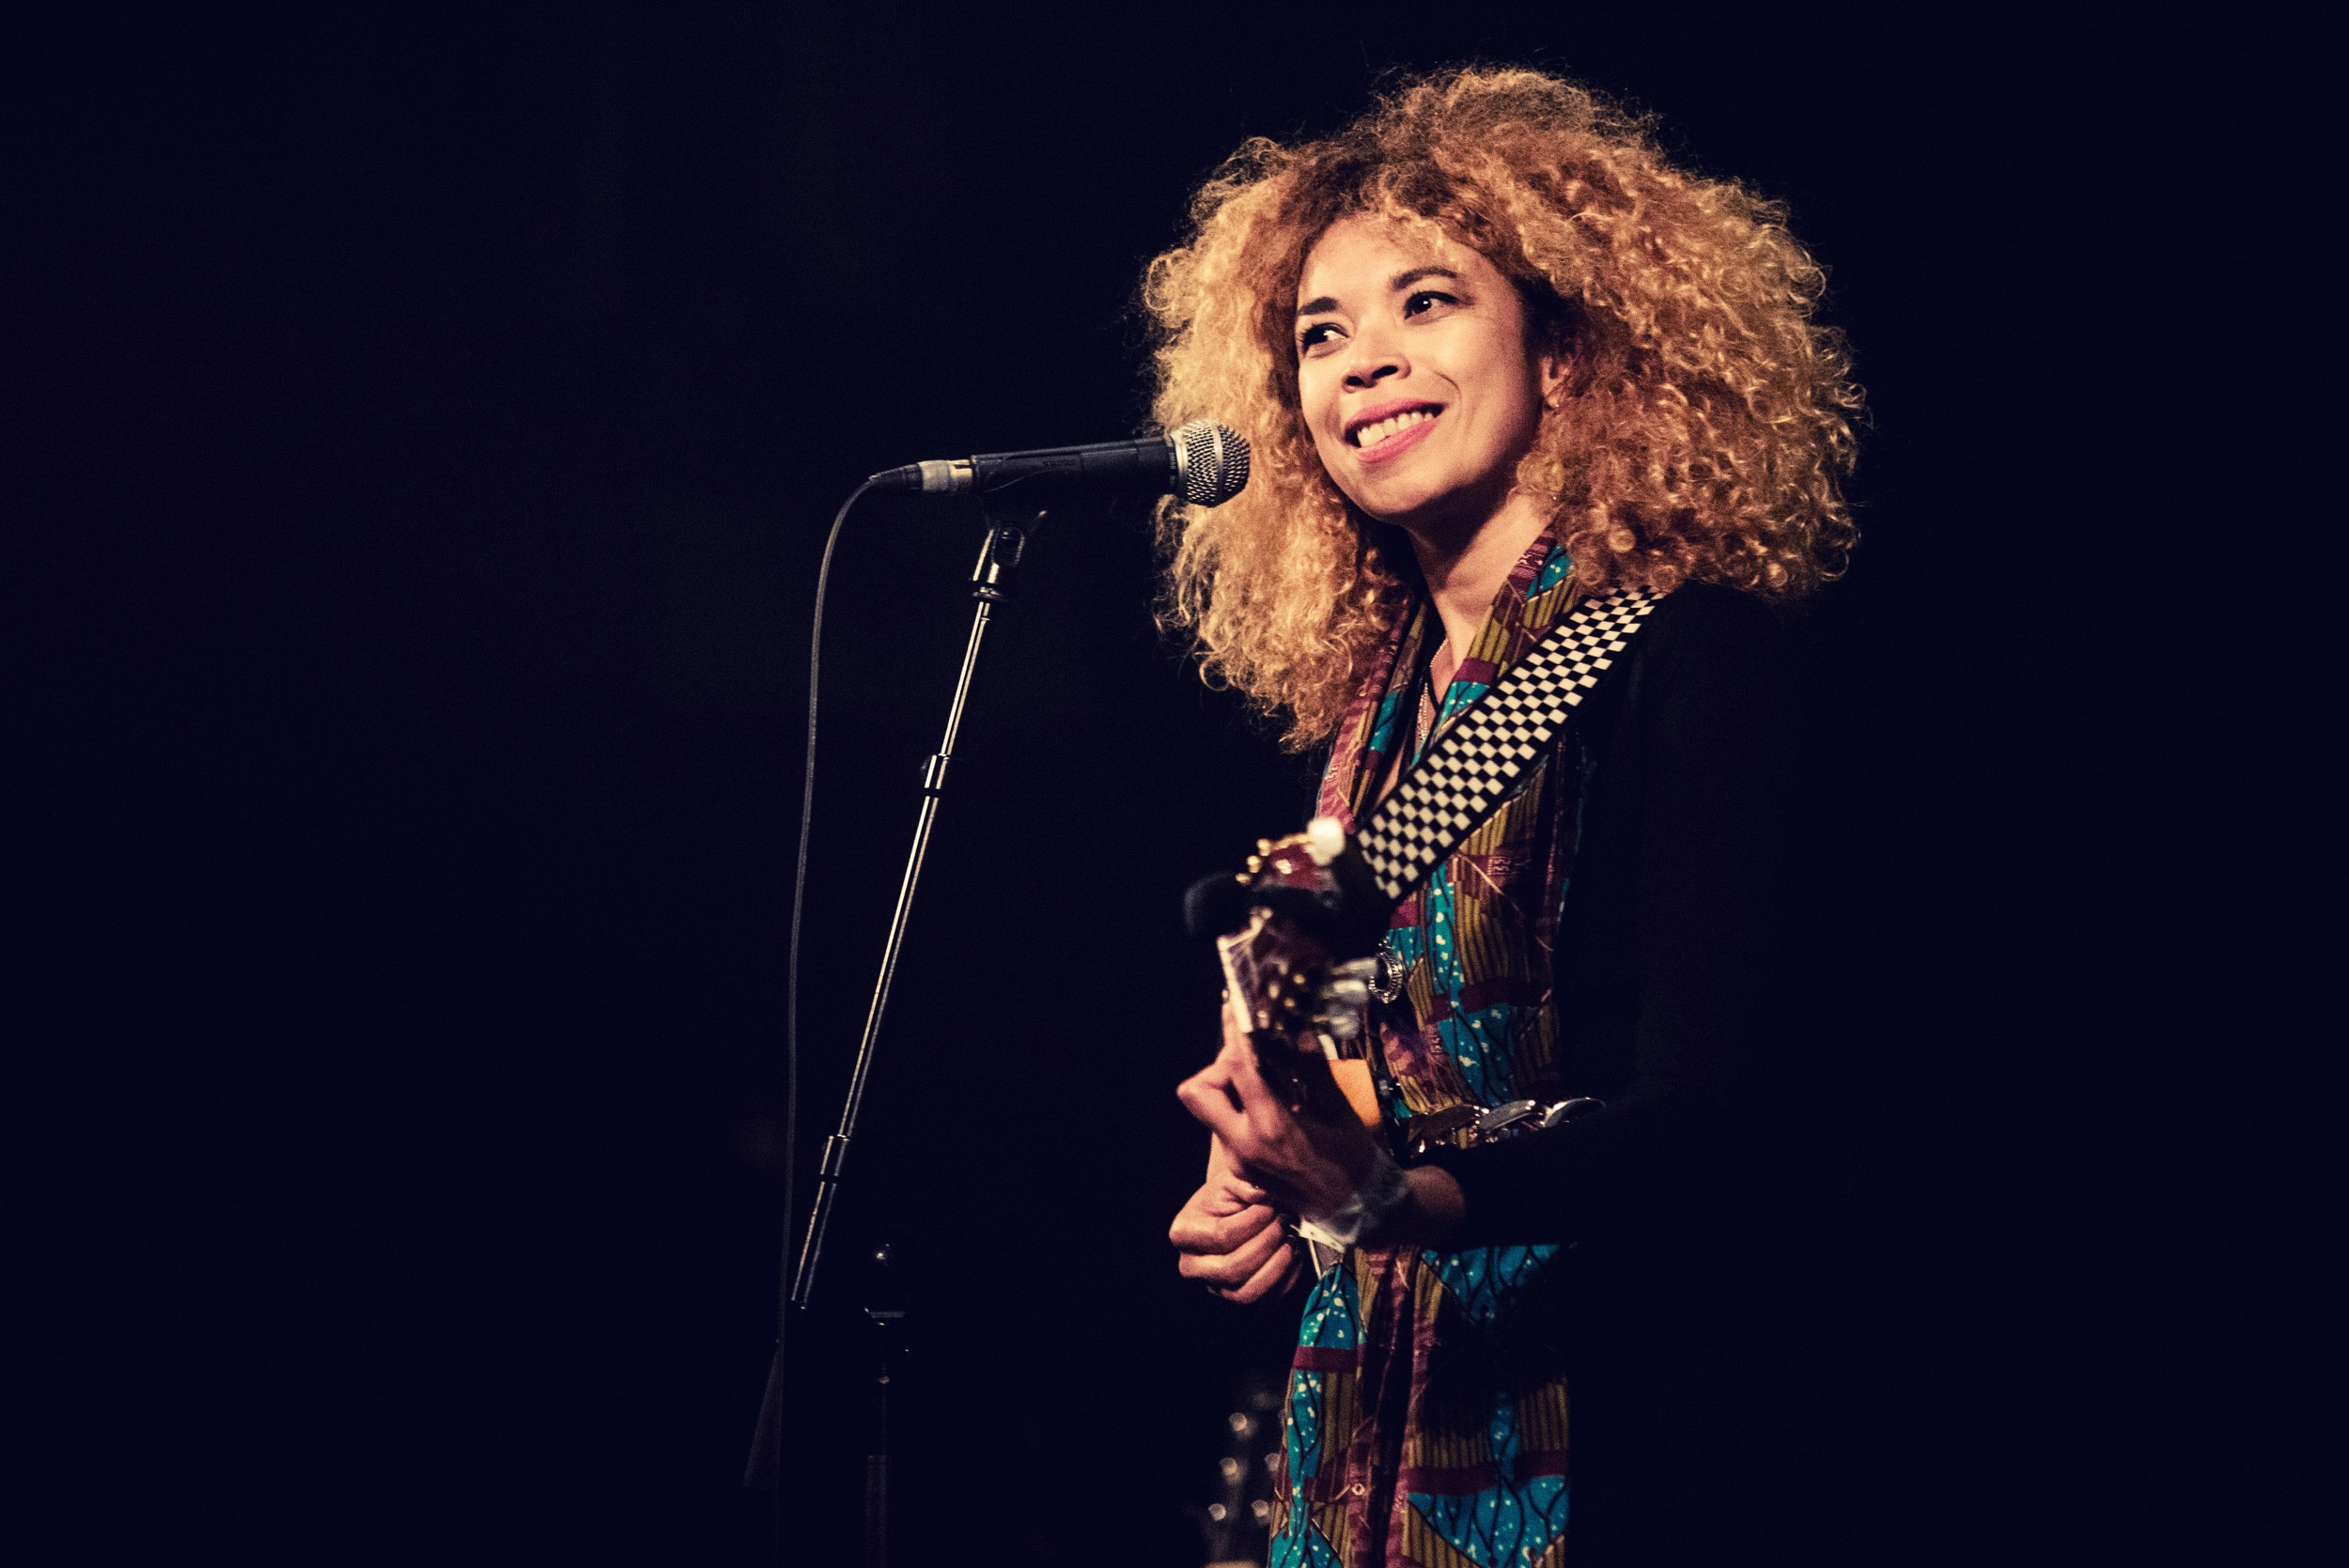 Photographie de la chanteuse Flavia Coelho en live